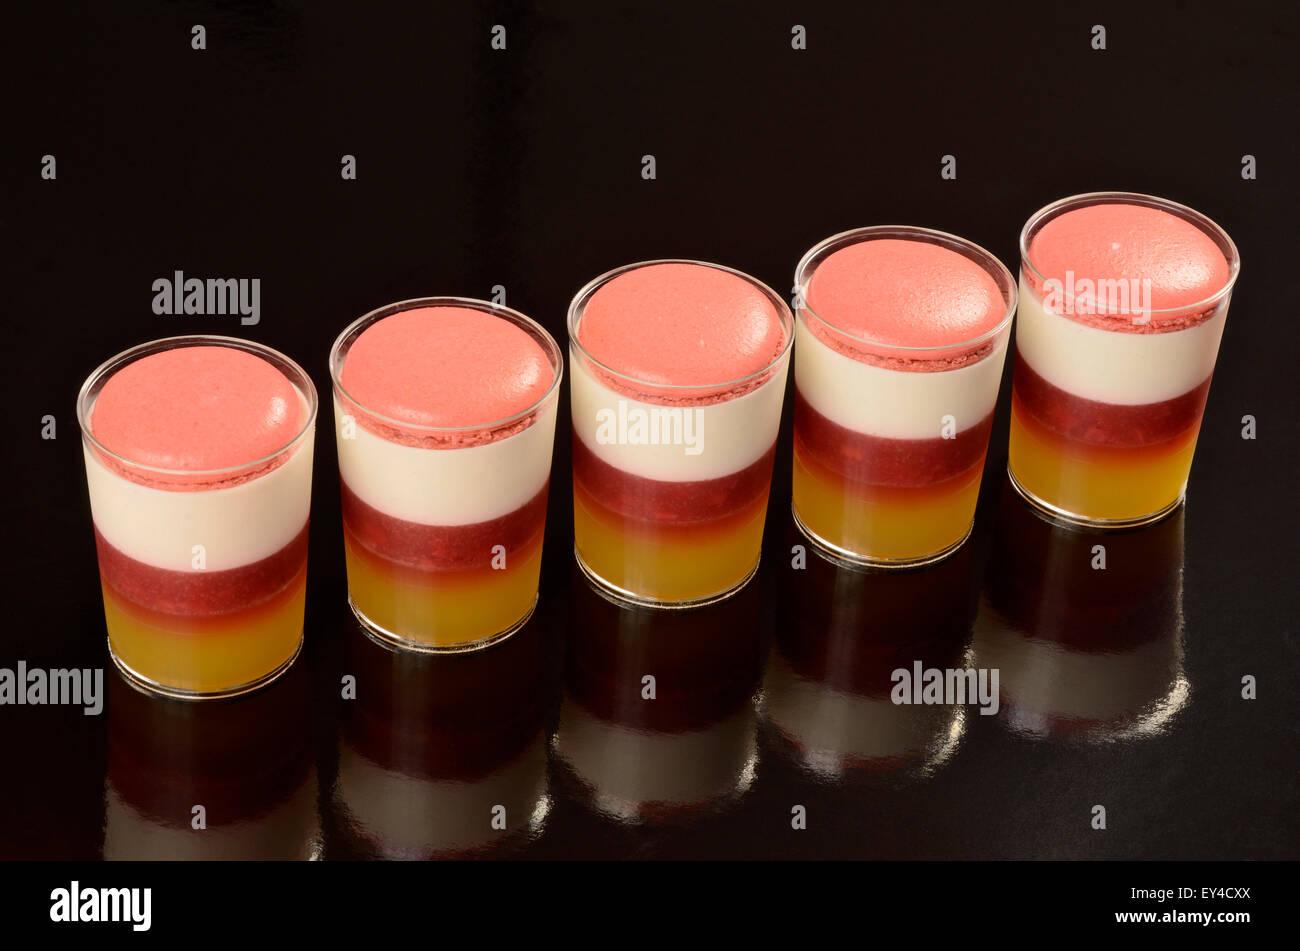 Macaron Fraise et desserts en verrines Photo Stock